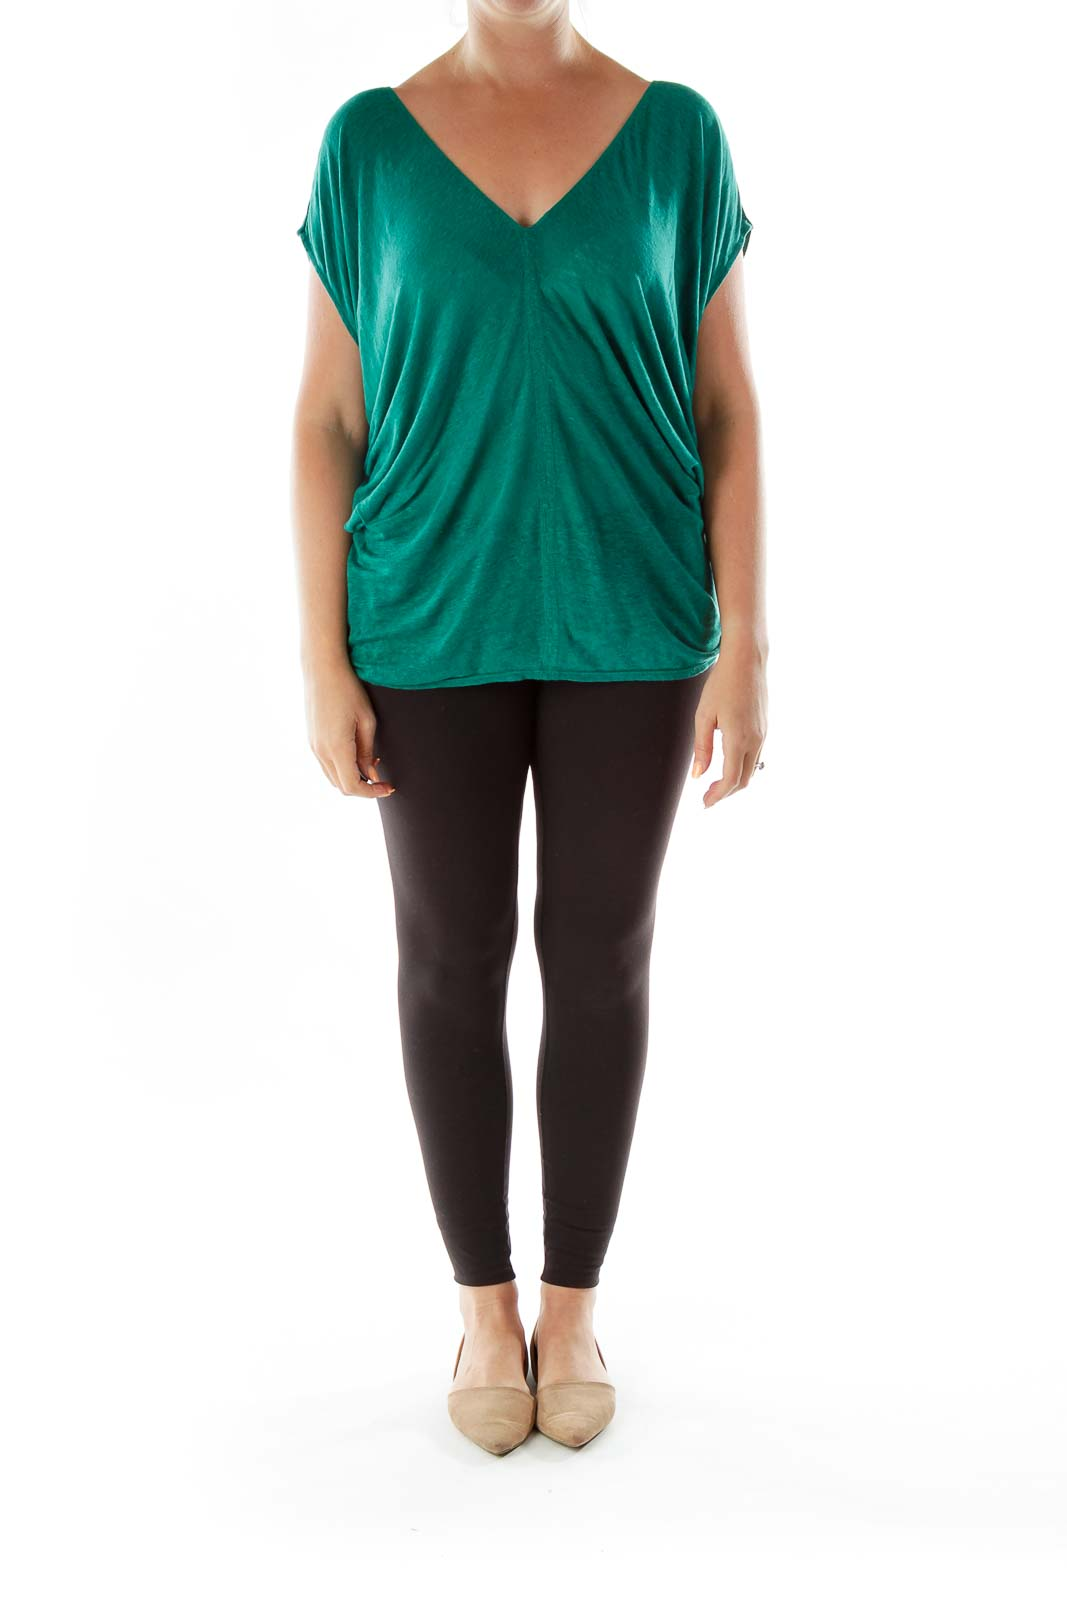 Green V-neck Bat-sleeve T-shirt